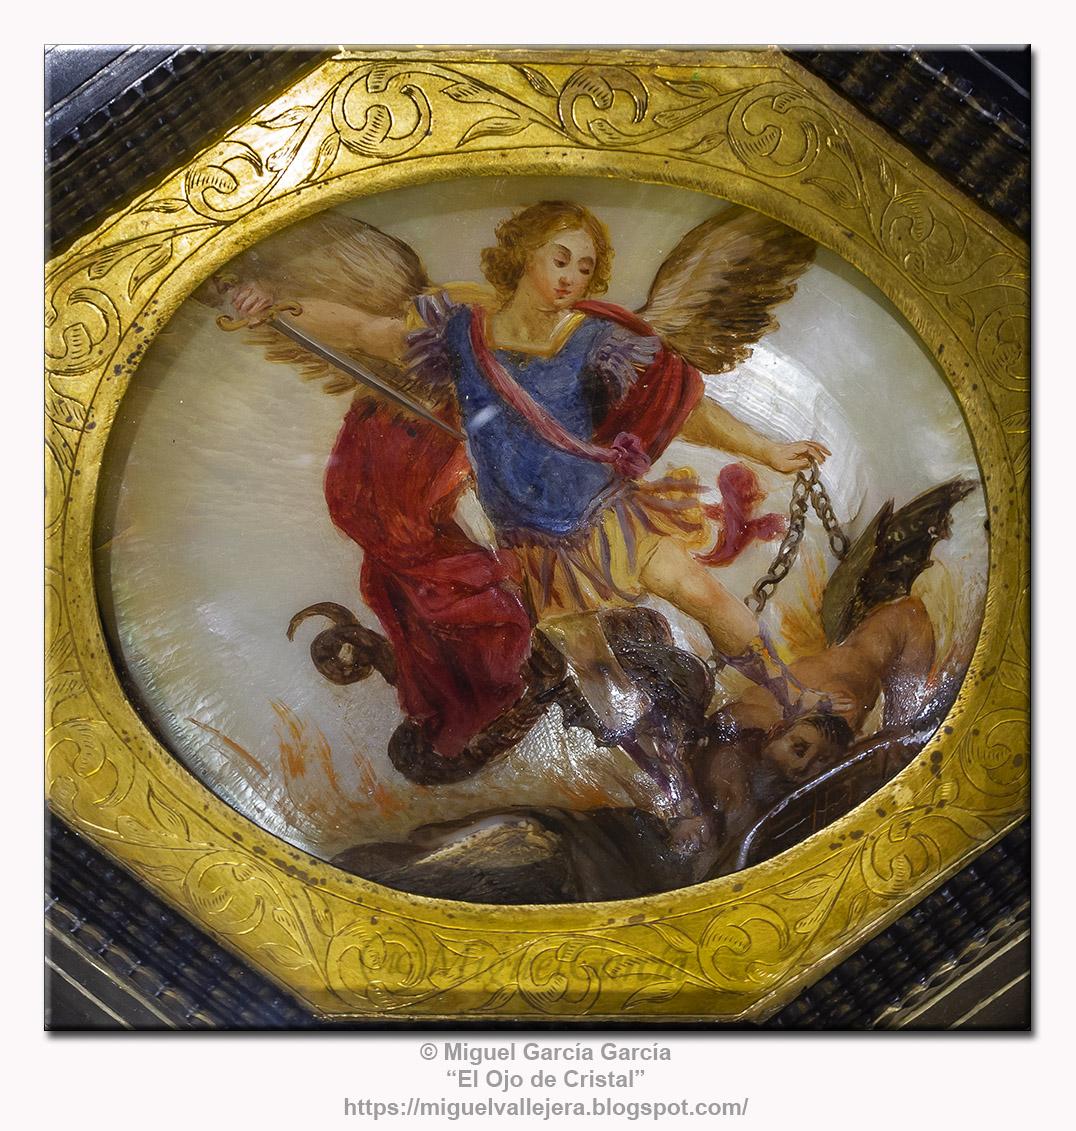 San Miguel Arcángel, Alba de Tormes (Salamanca)